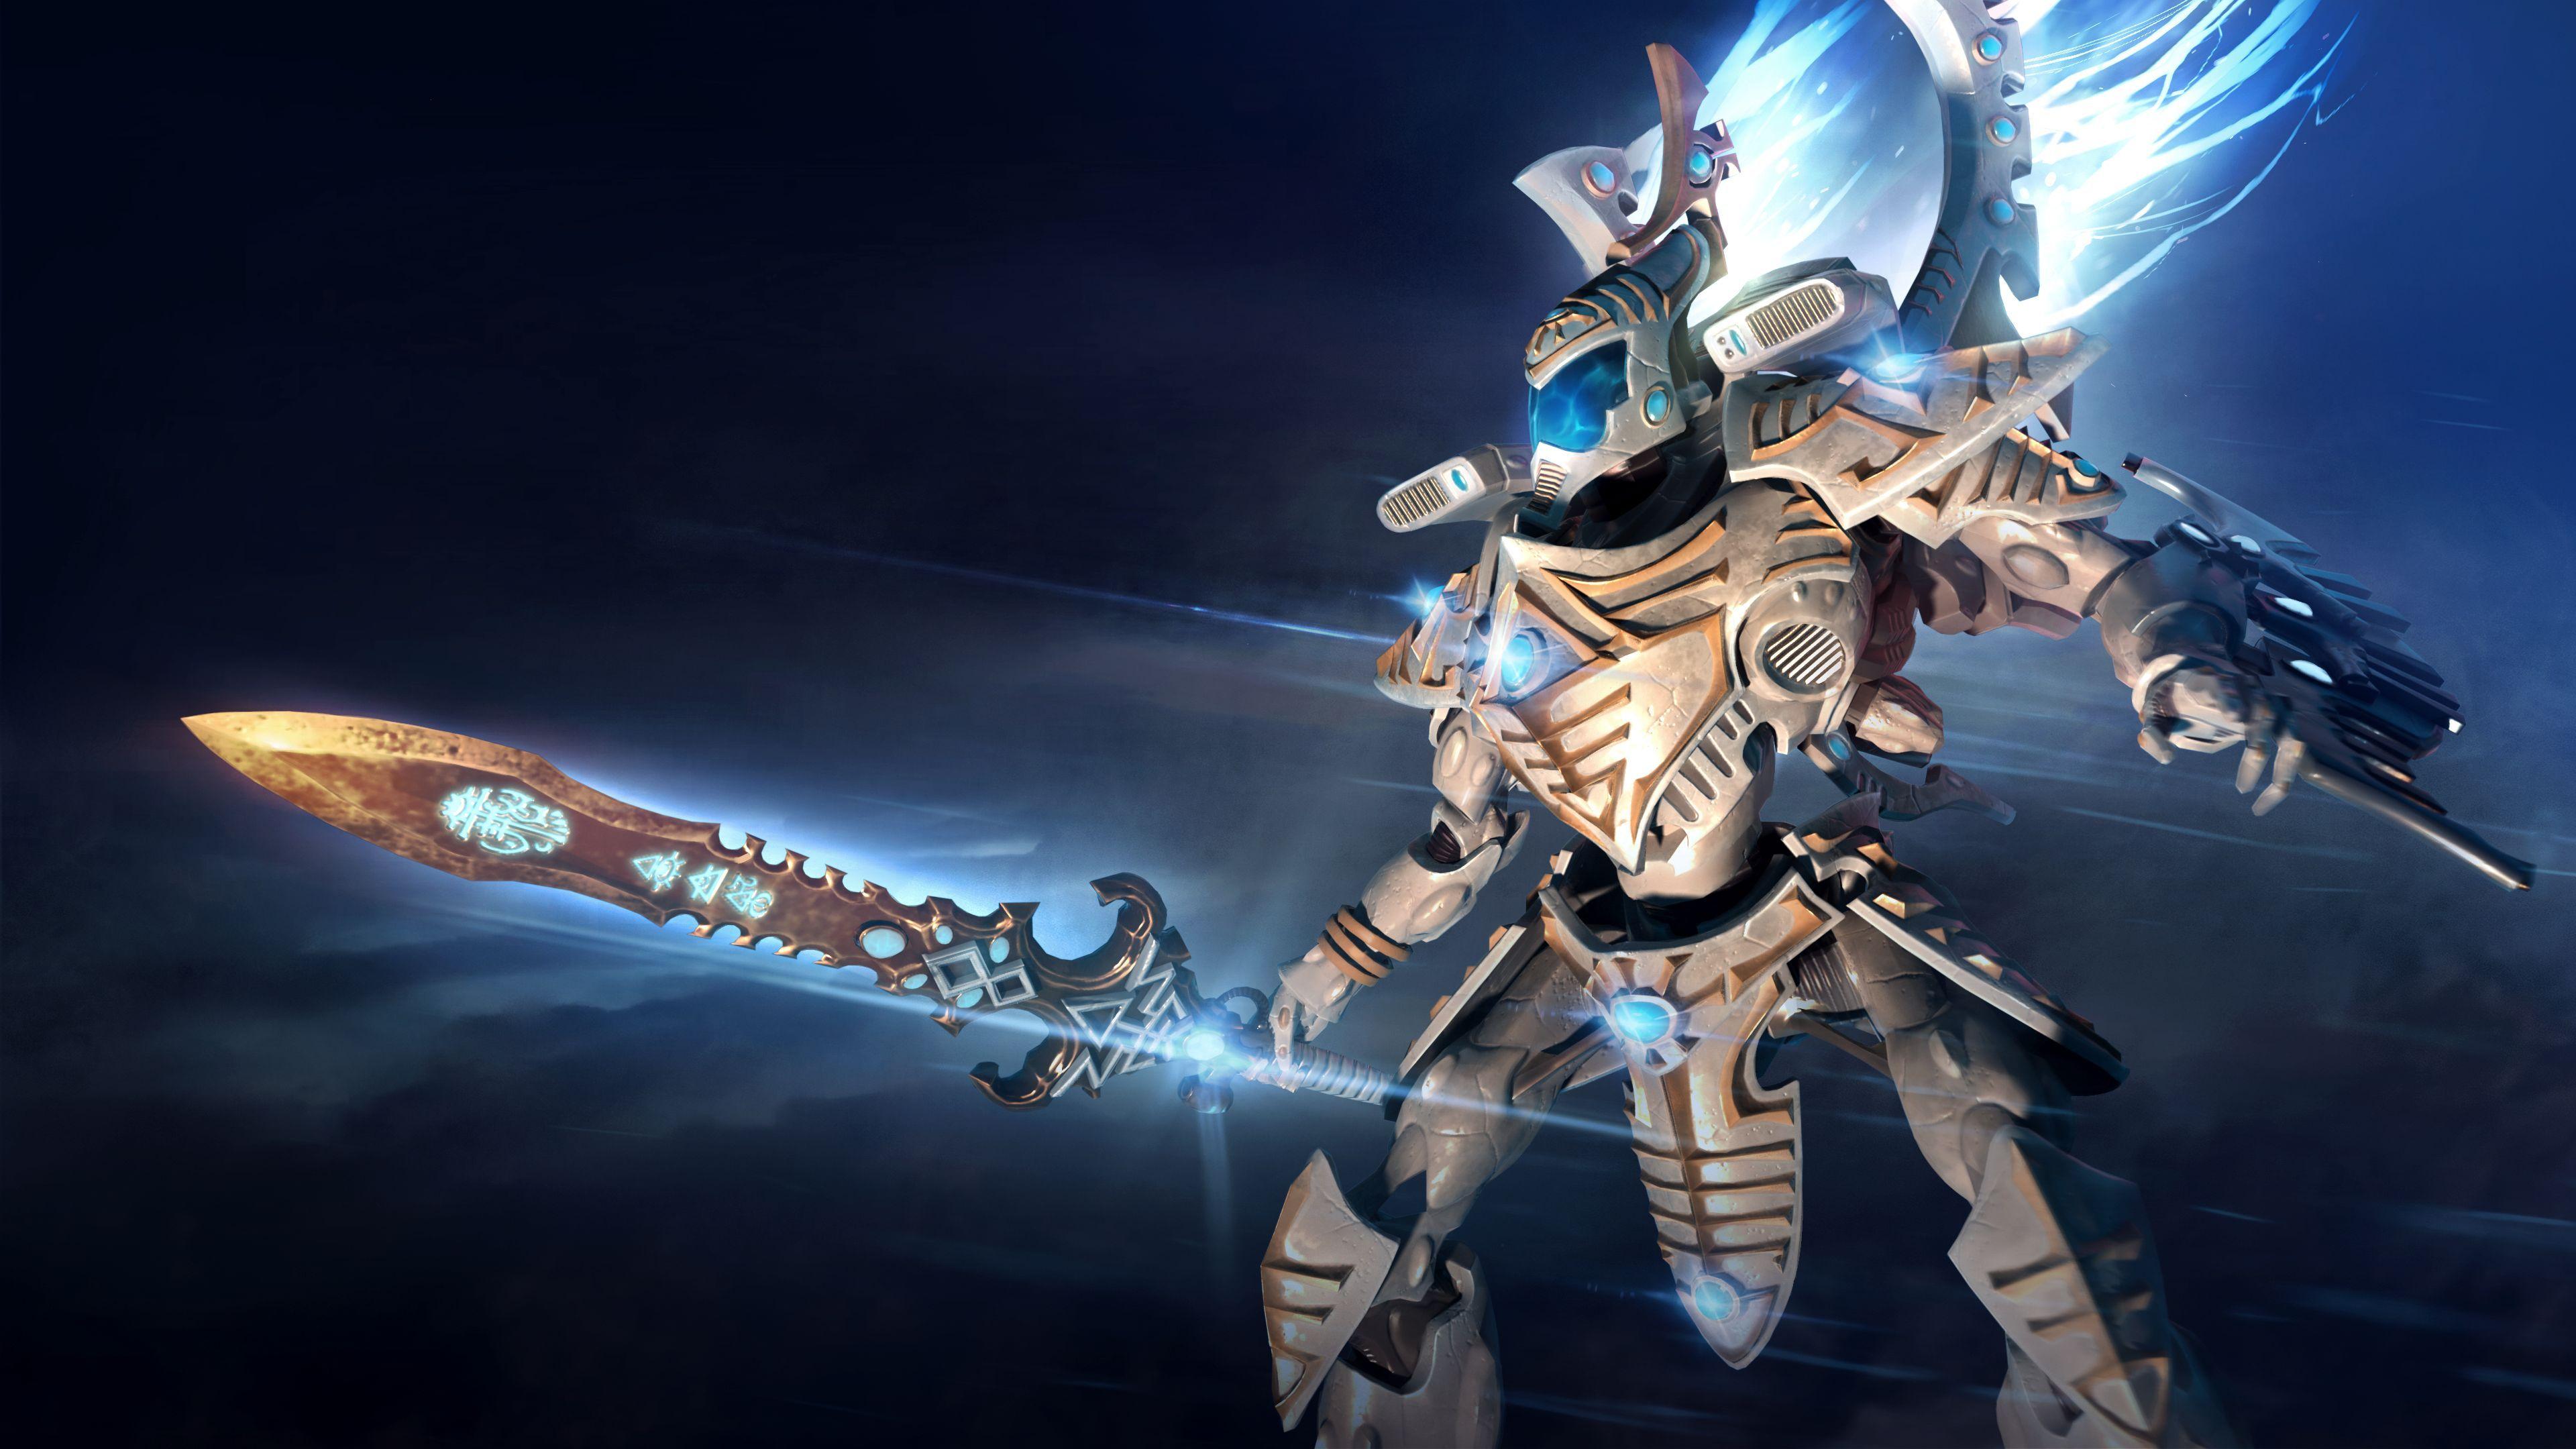 Dawn of War III Warhammer, Warhammer lore, Warhammer 40000